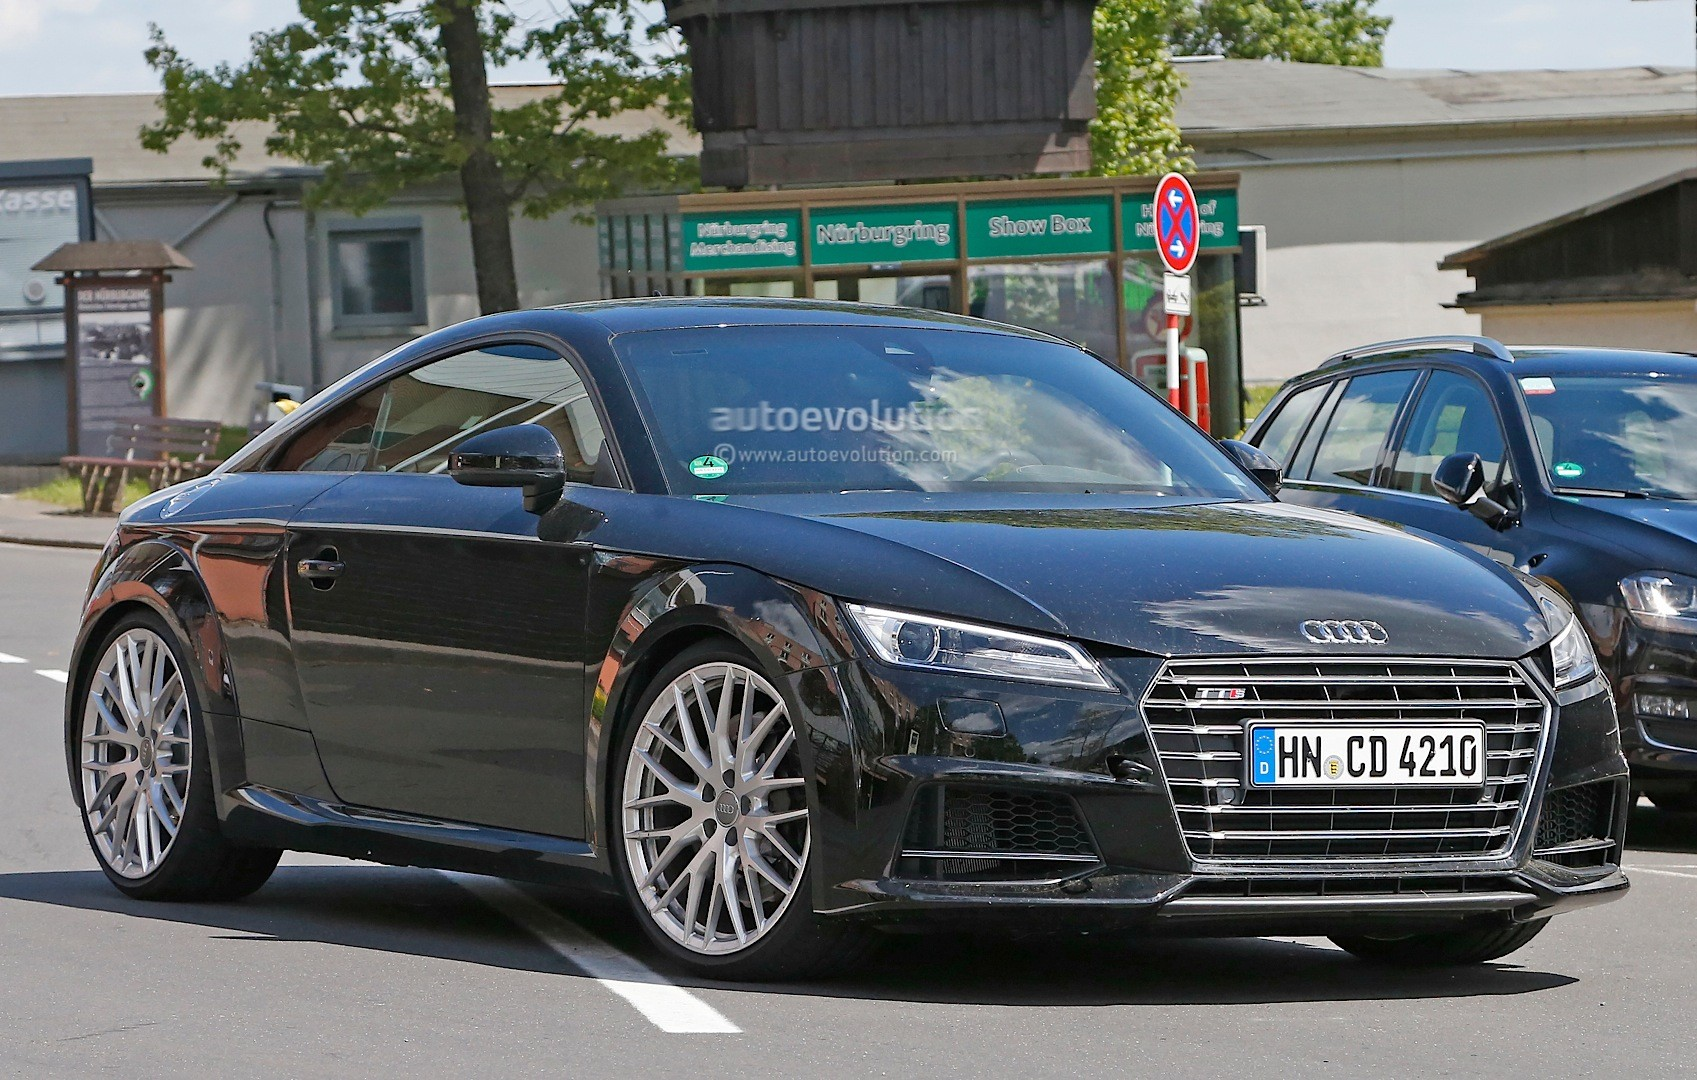 Kelebihan Kekurangan Audi A12 Murah Berkualitas